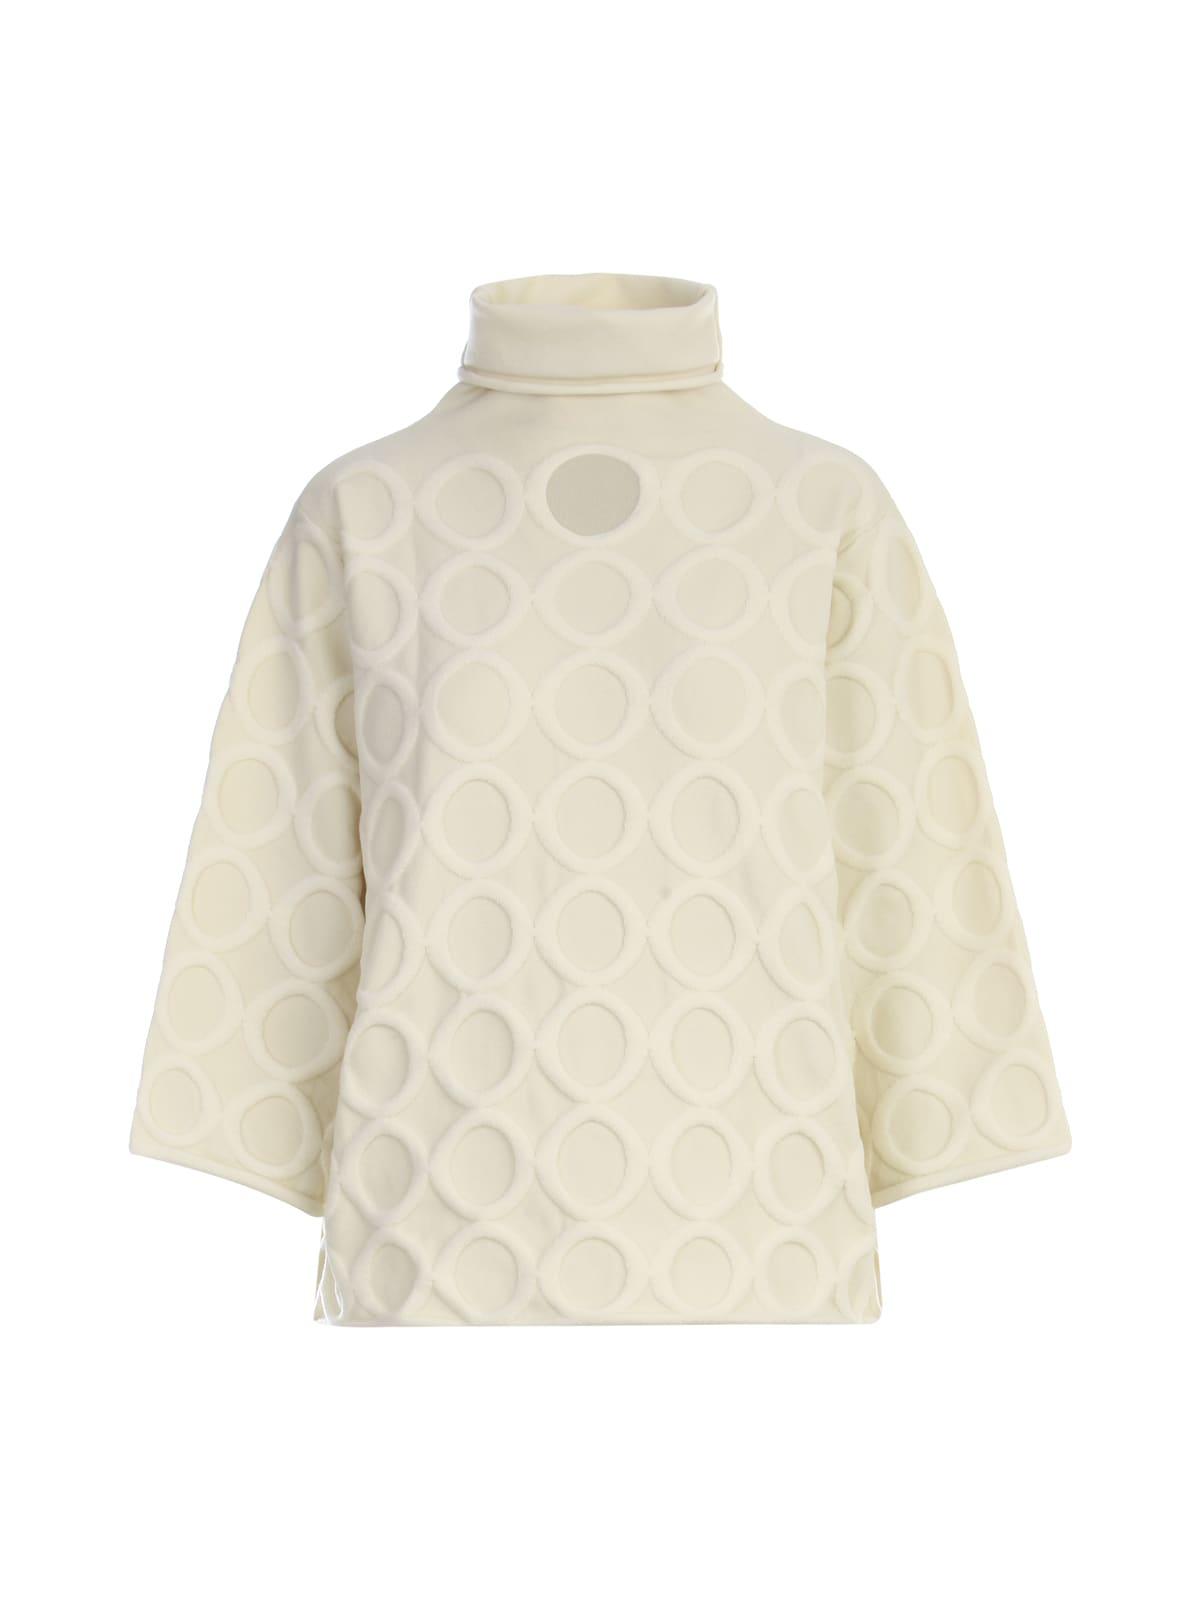 Sweater W/rings